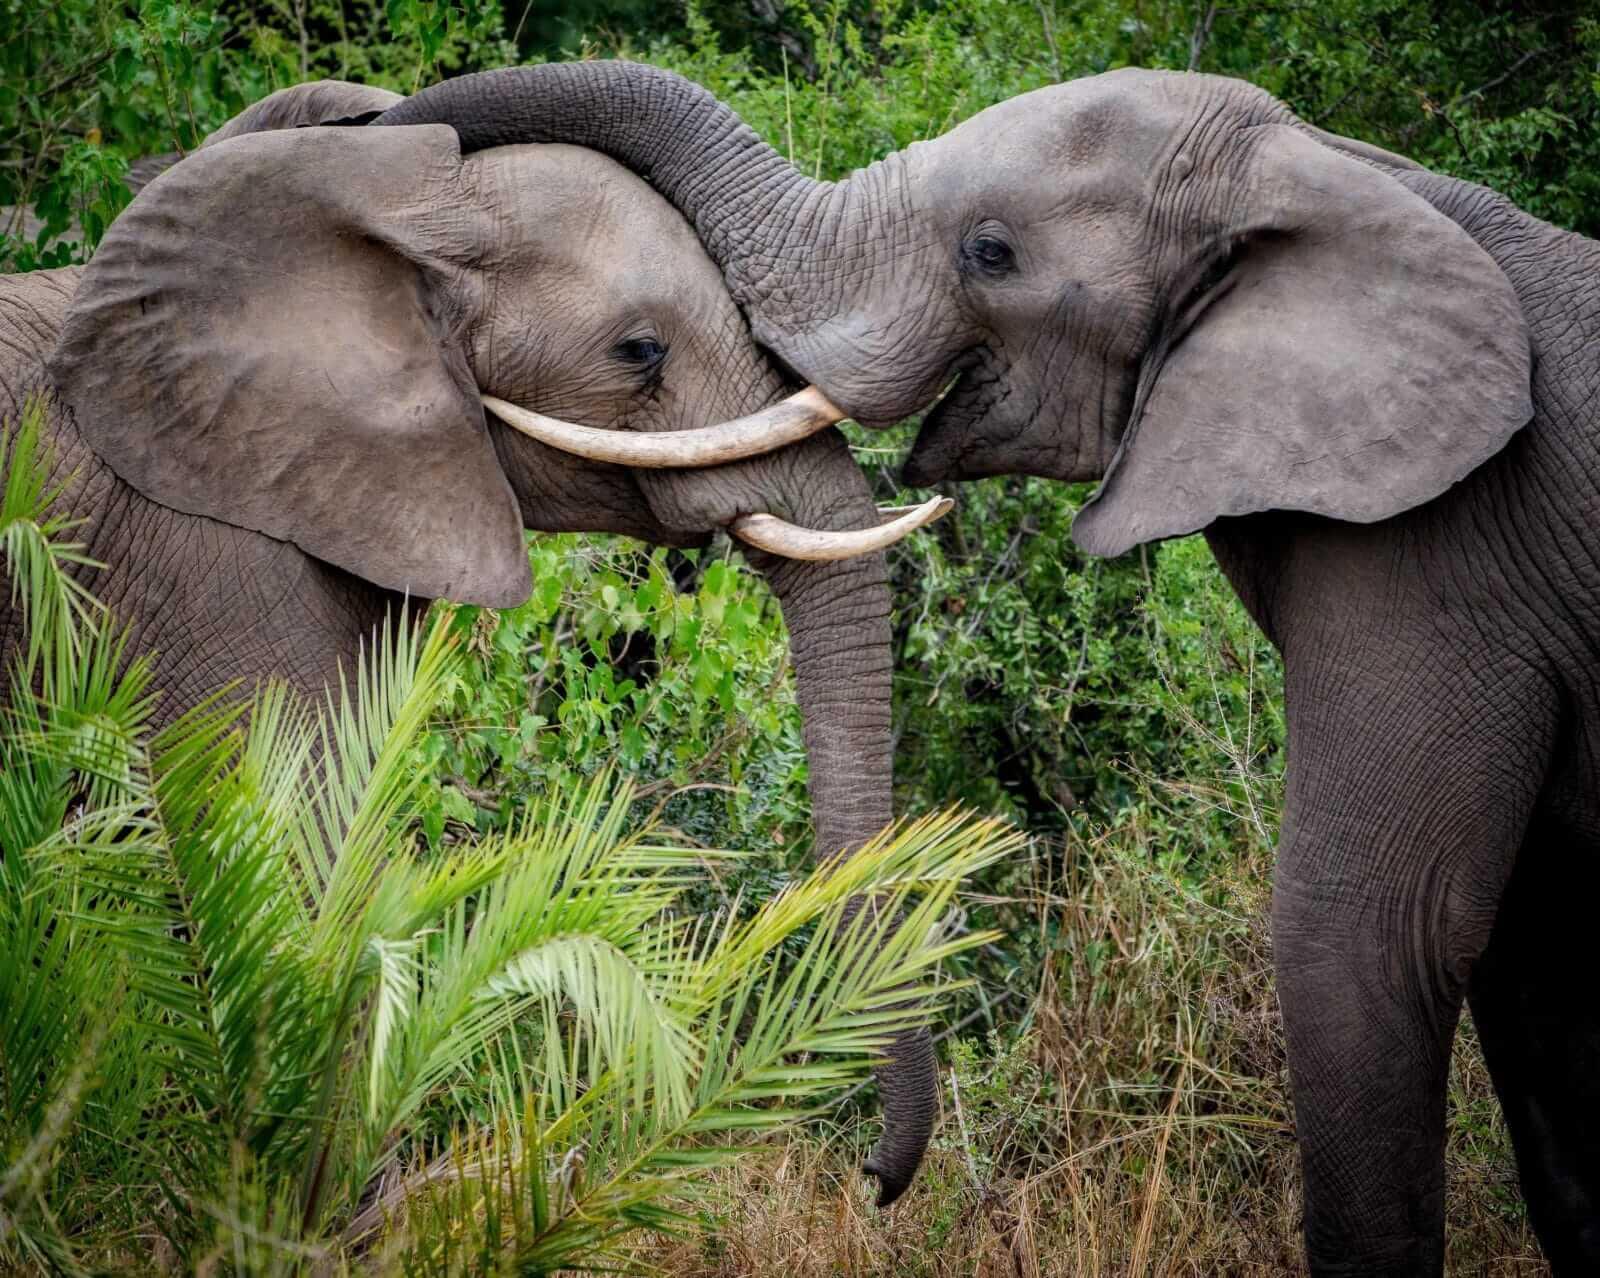 Olifanten bij andBeyond Kirkman's Kamp Zuid-Afrika